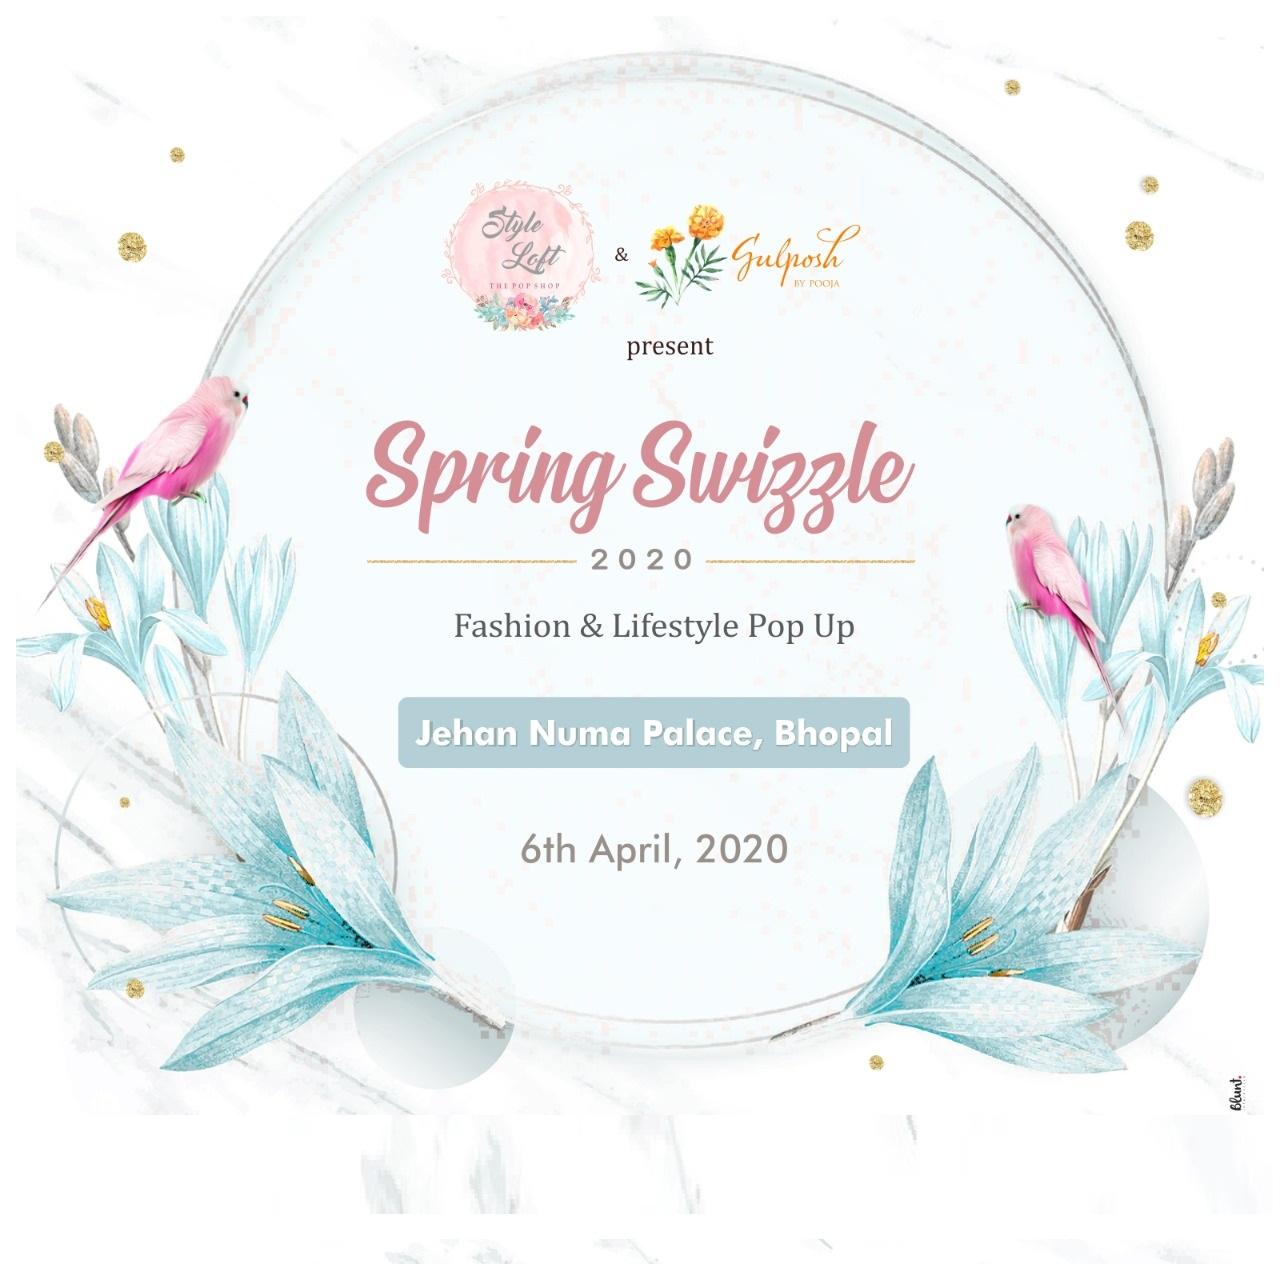 Spring Swizzle Fashion & Lifestyle Pop Up